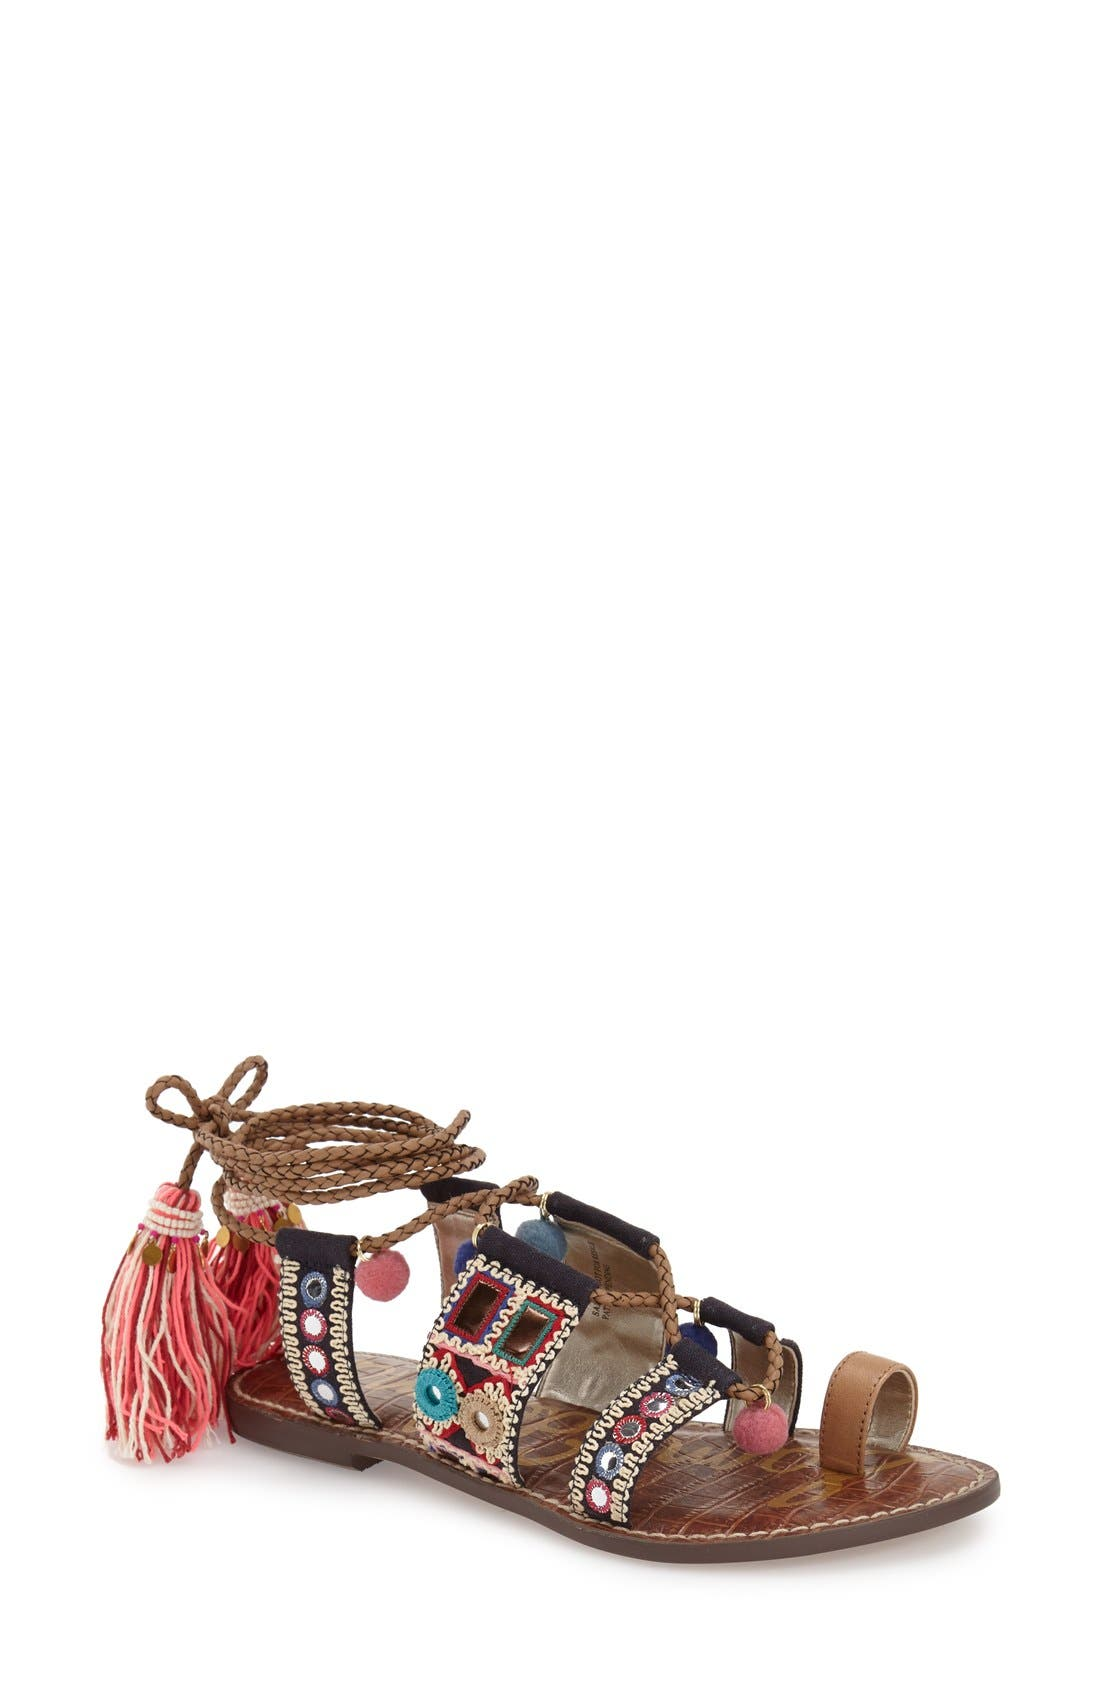 Main Image - Sam Edelman 'Gretchen' Embellished Lace-Up Sandal (Women)